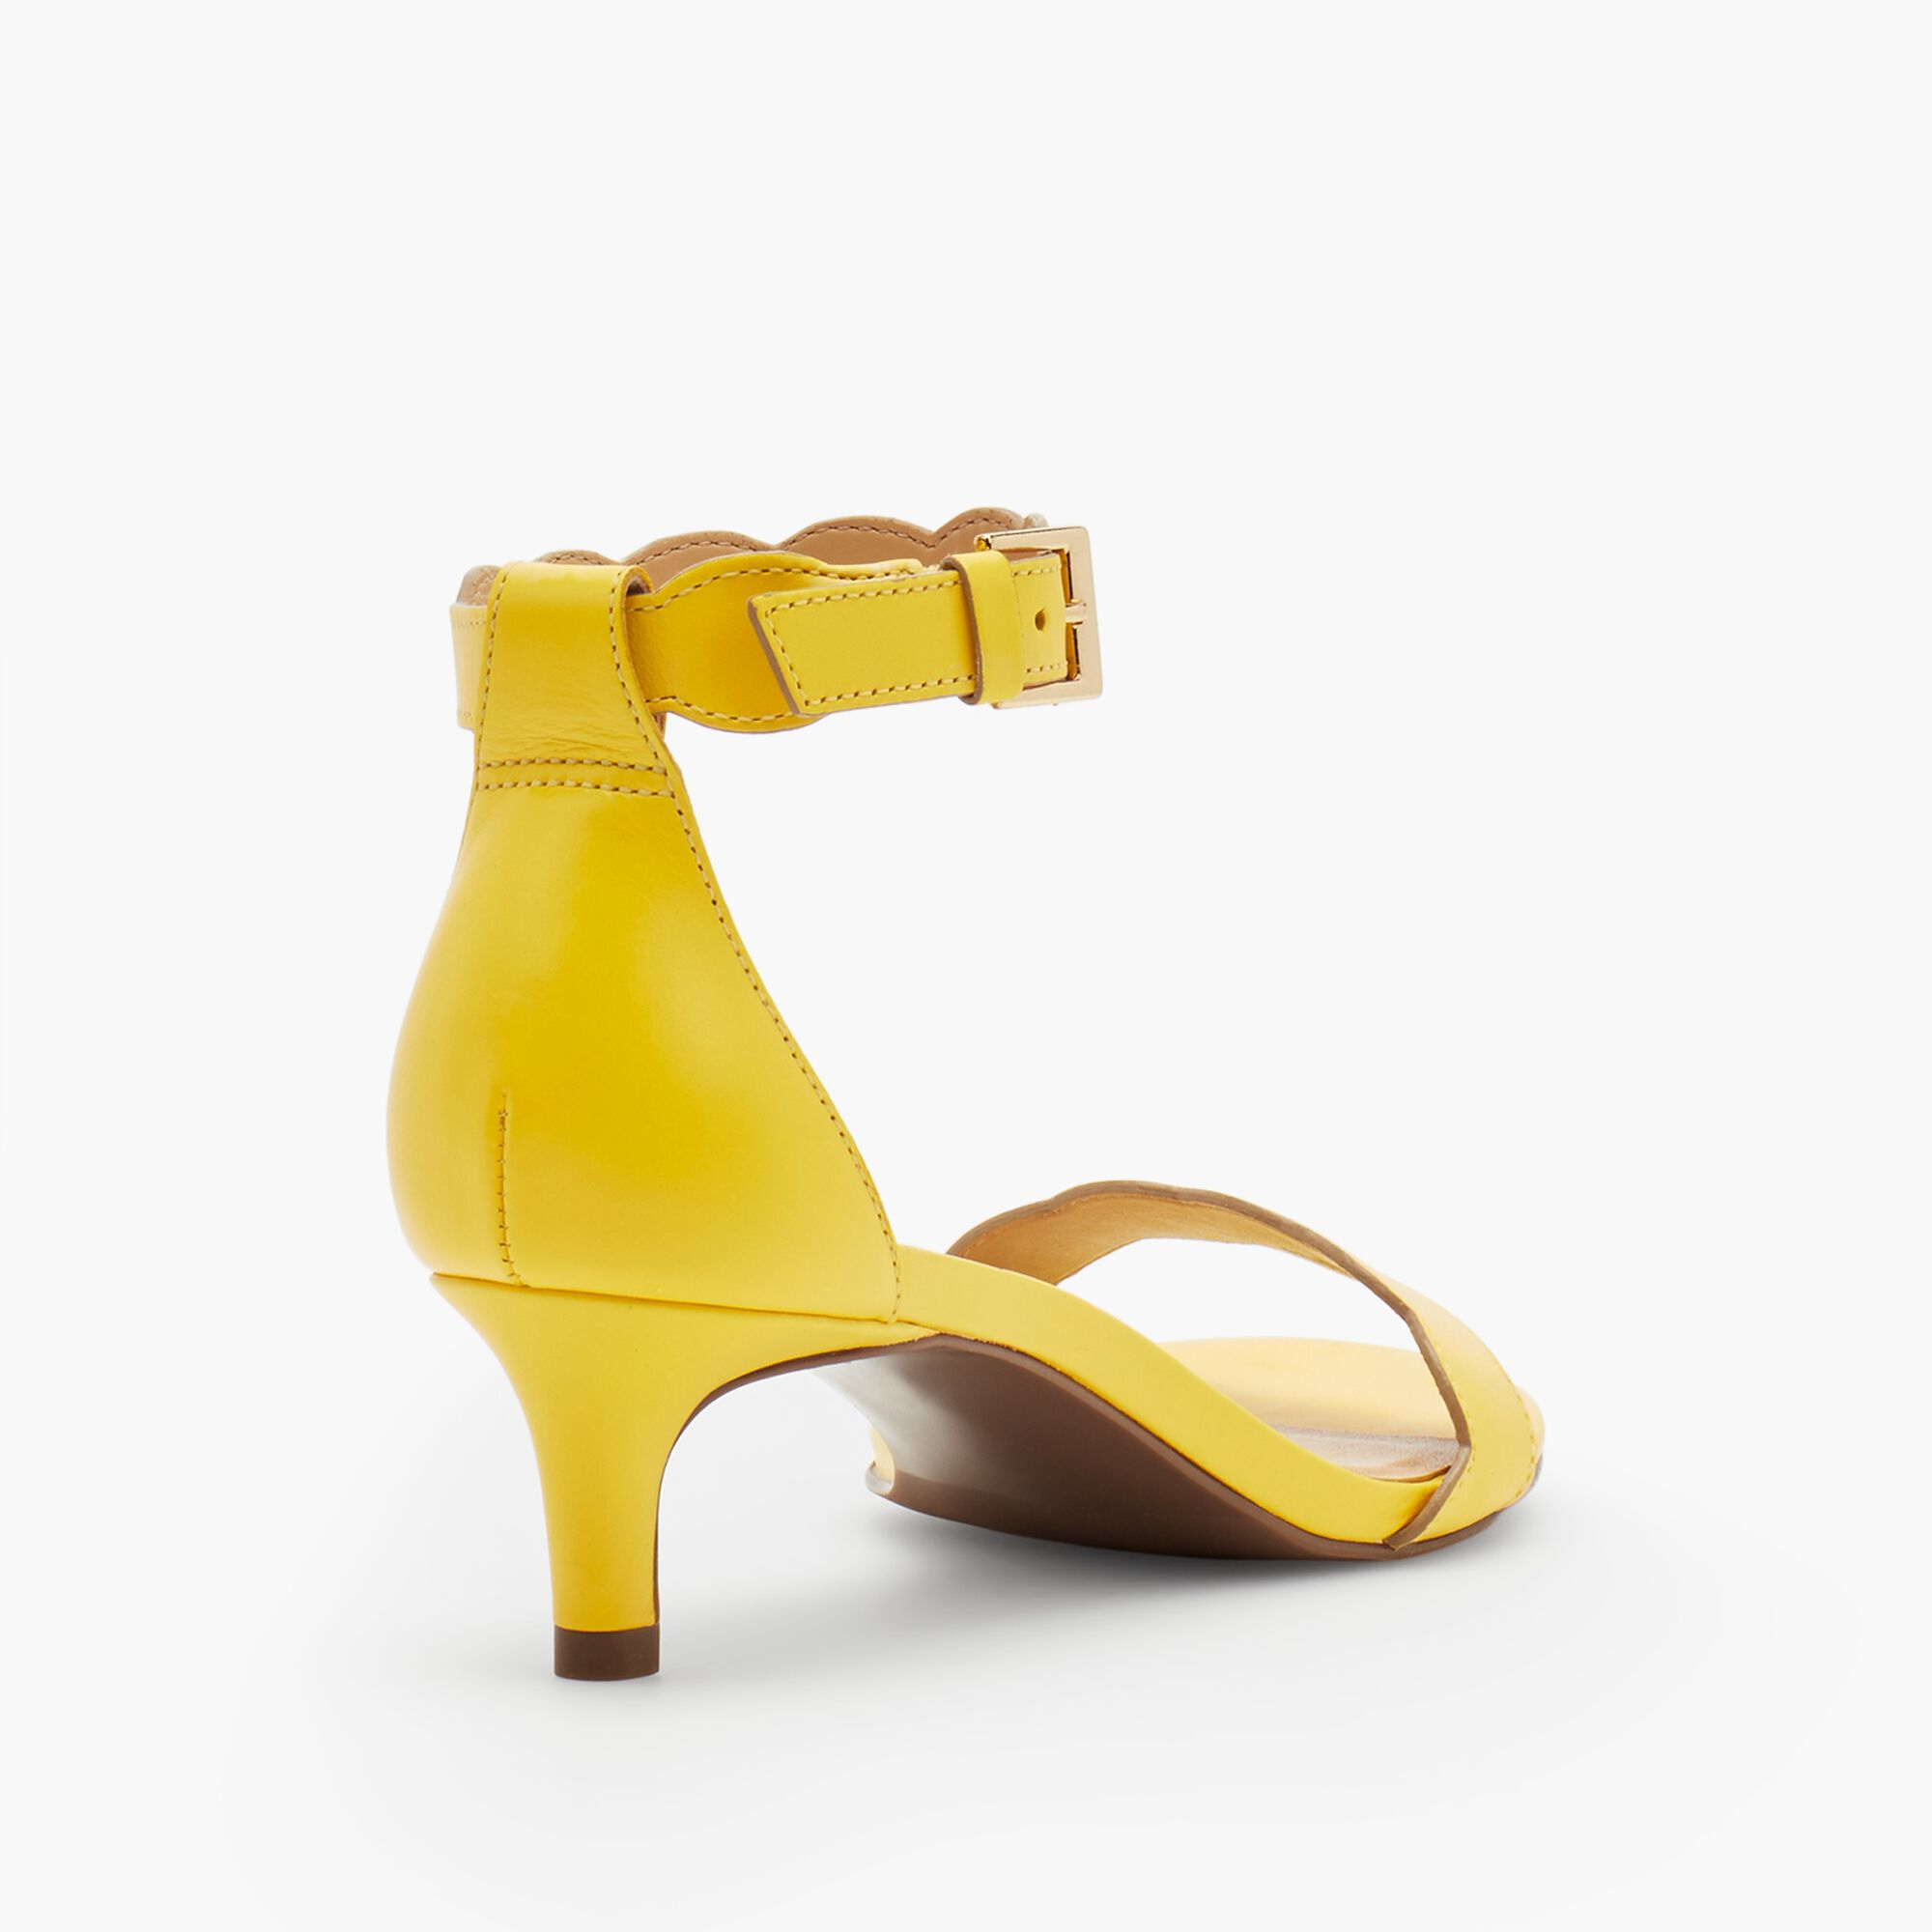 c7c511b1d Pila Kitten-Heel Sandals - Vachetta Leather Opens a New Window.